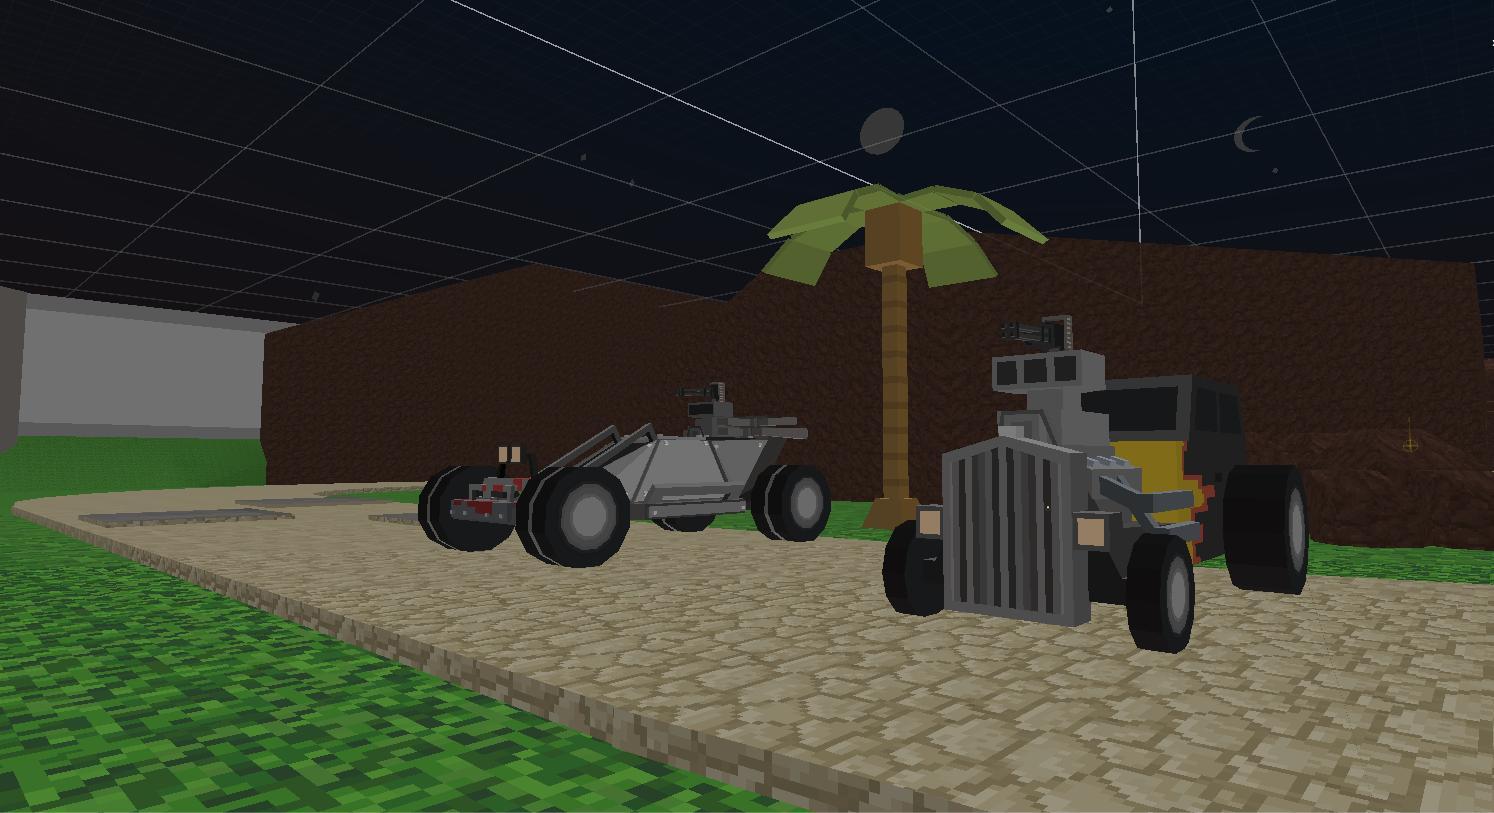 Blocky Combat Strike Zombie Survival 1.25 Screenshot 20